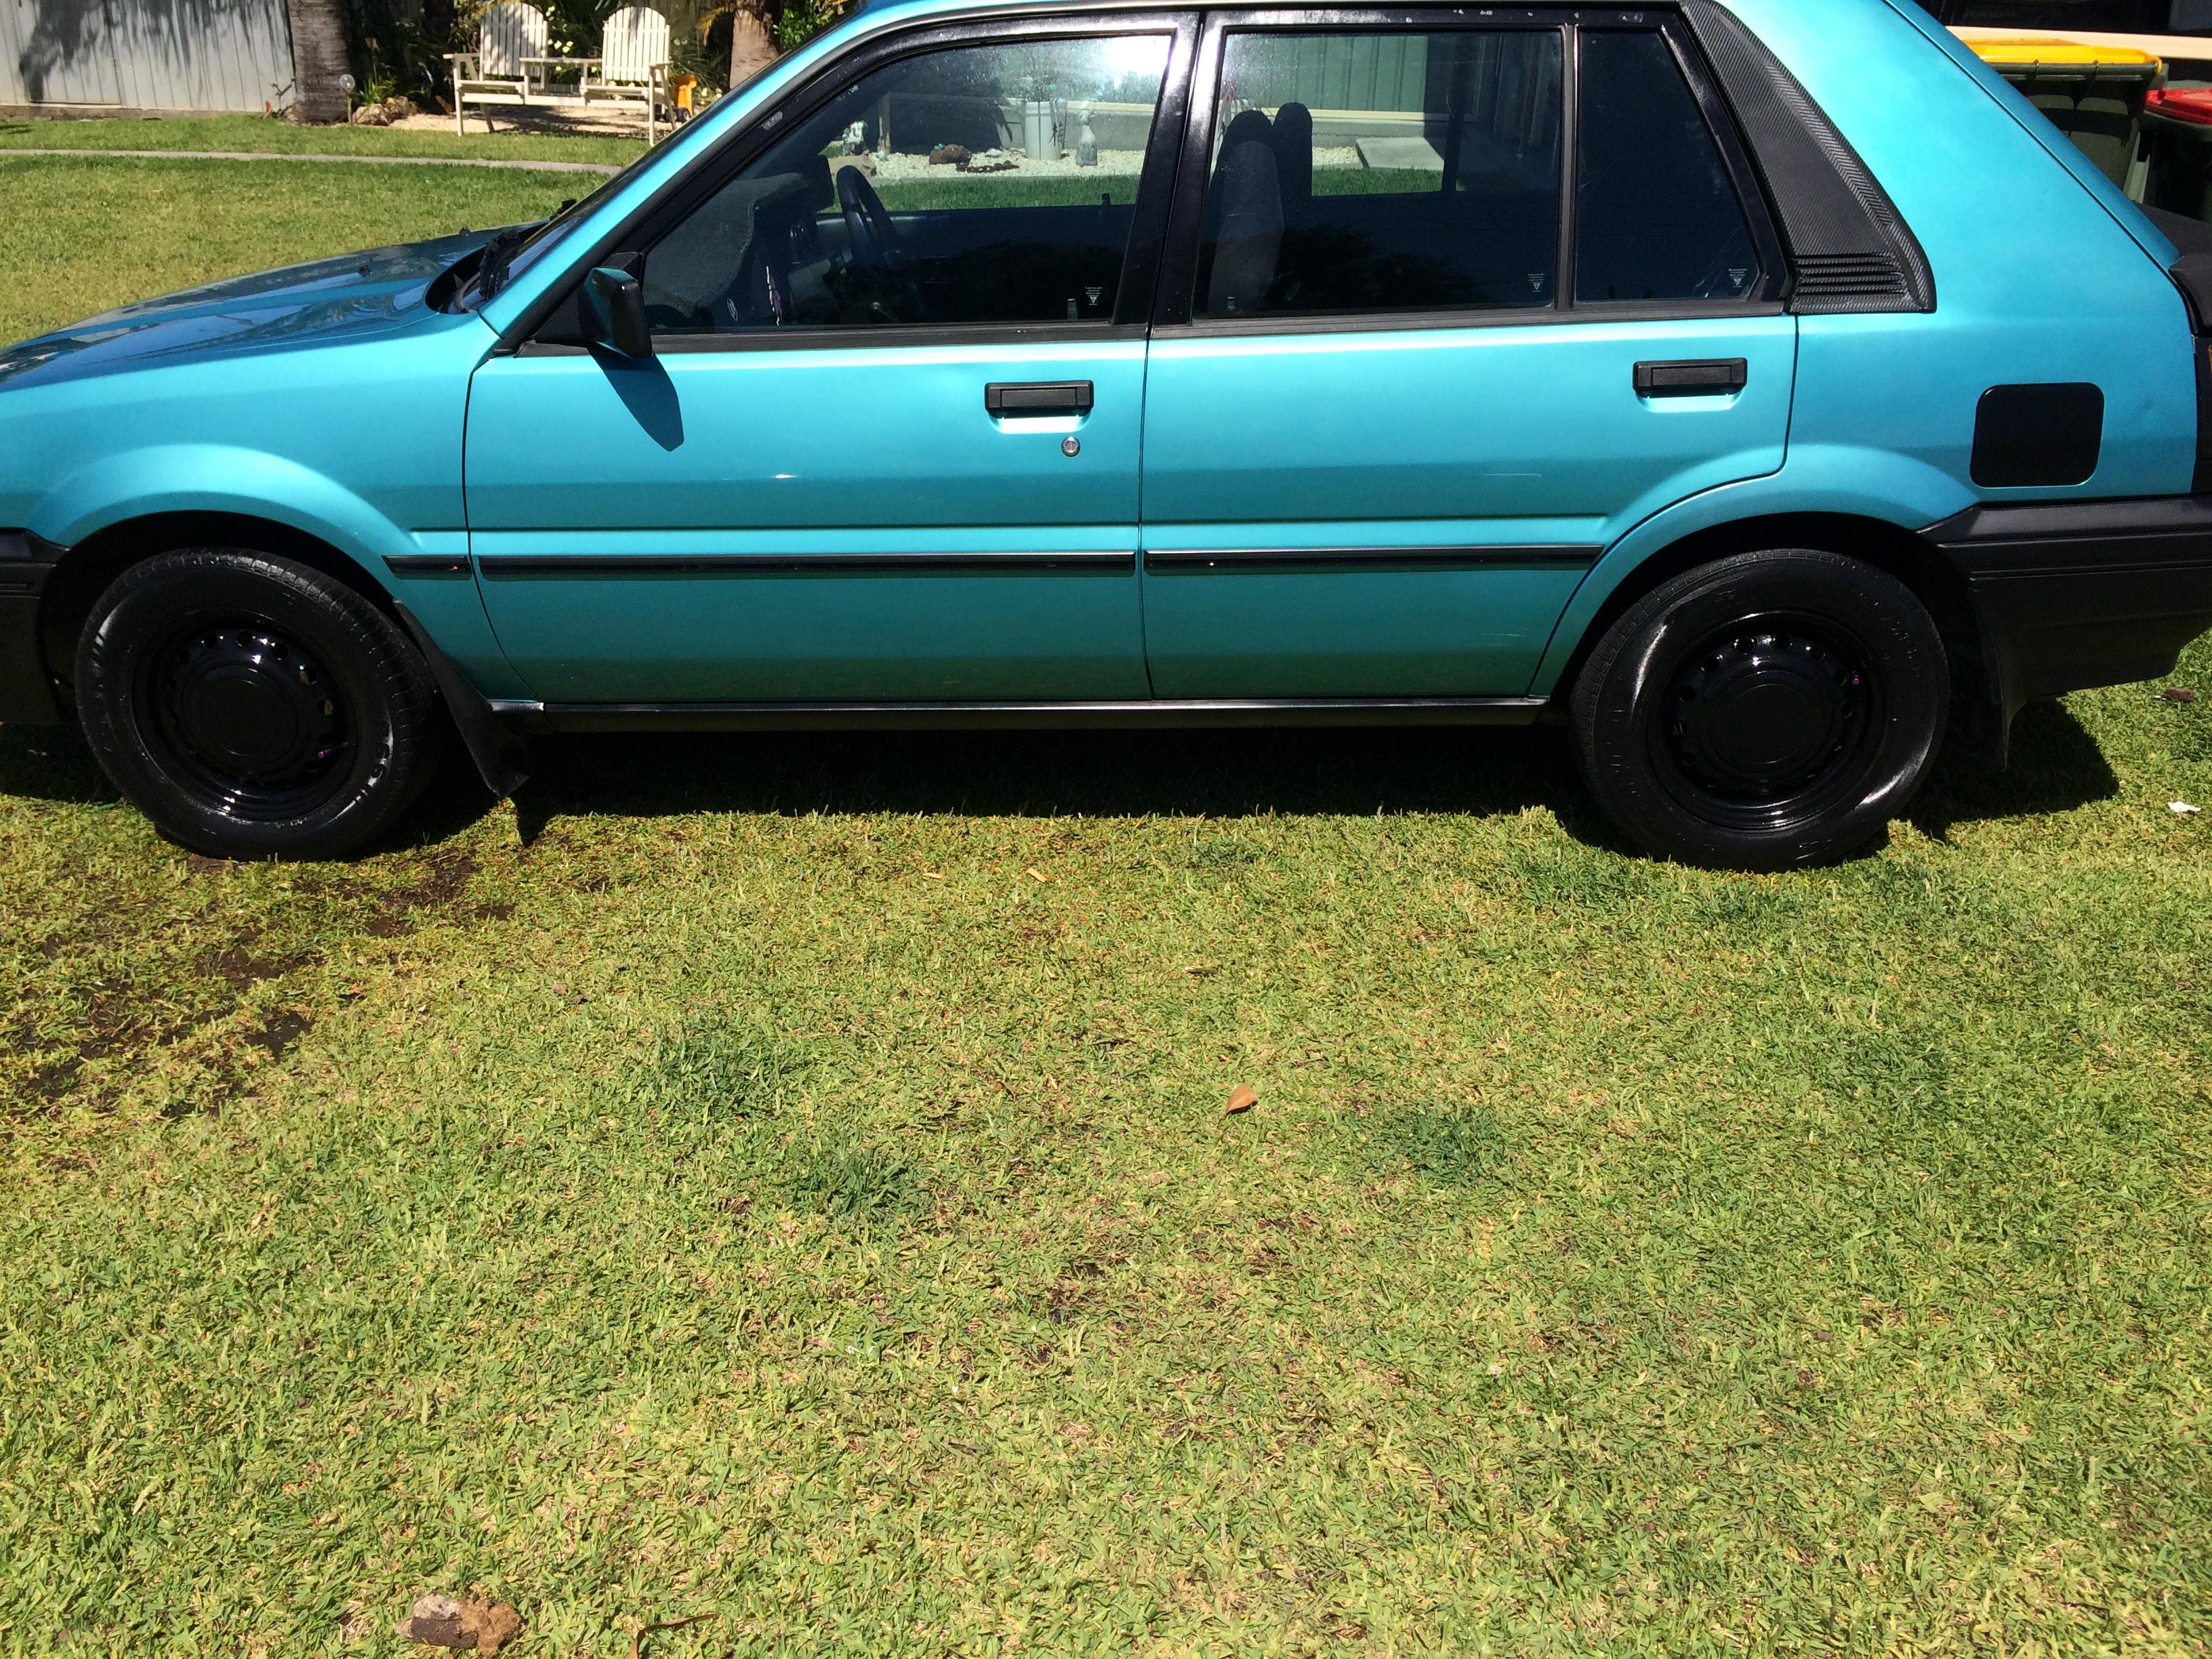 1987 Nissan Pulsar | Car Sales NSW: Mid North Coast #2934289